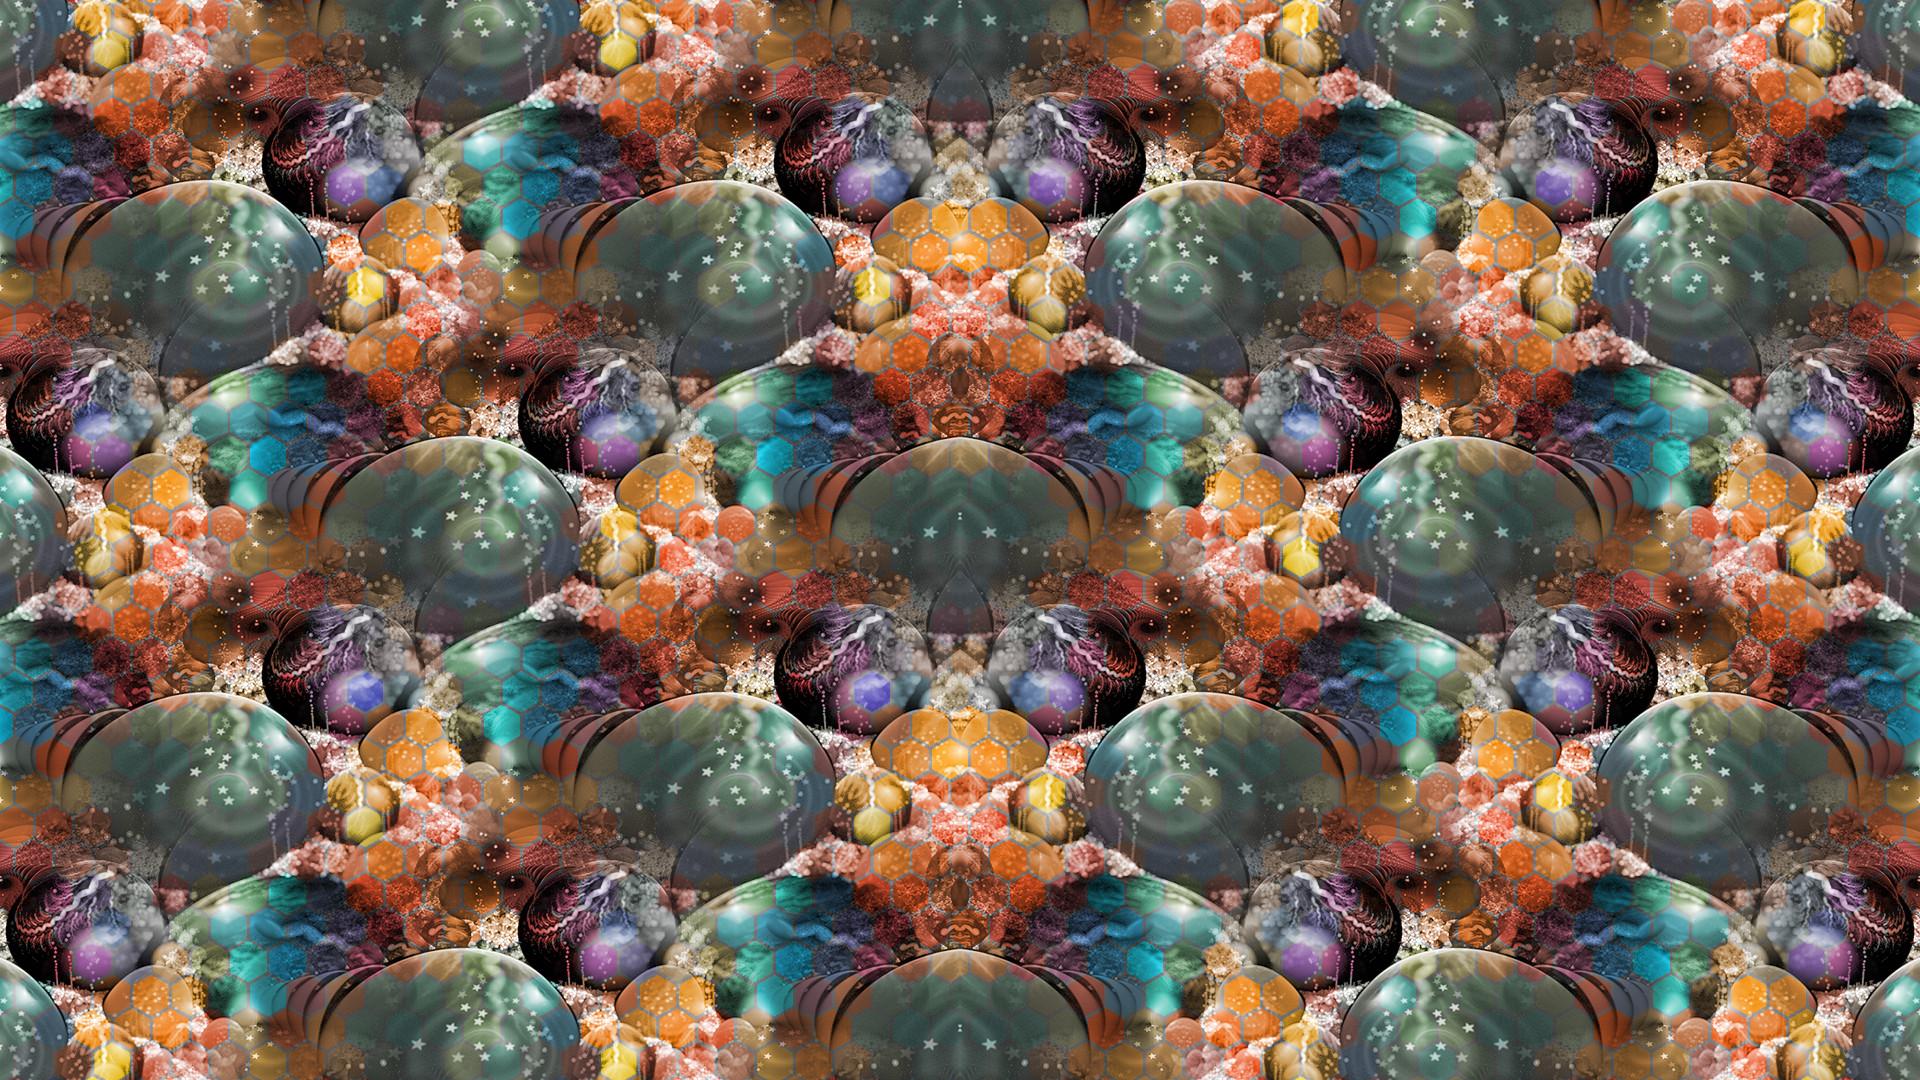 General 1920x1080 abstract fractal pattern symmetry digital art